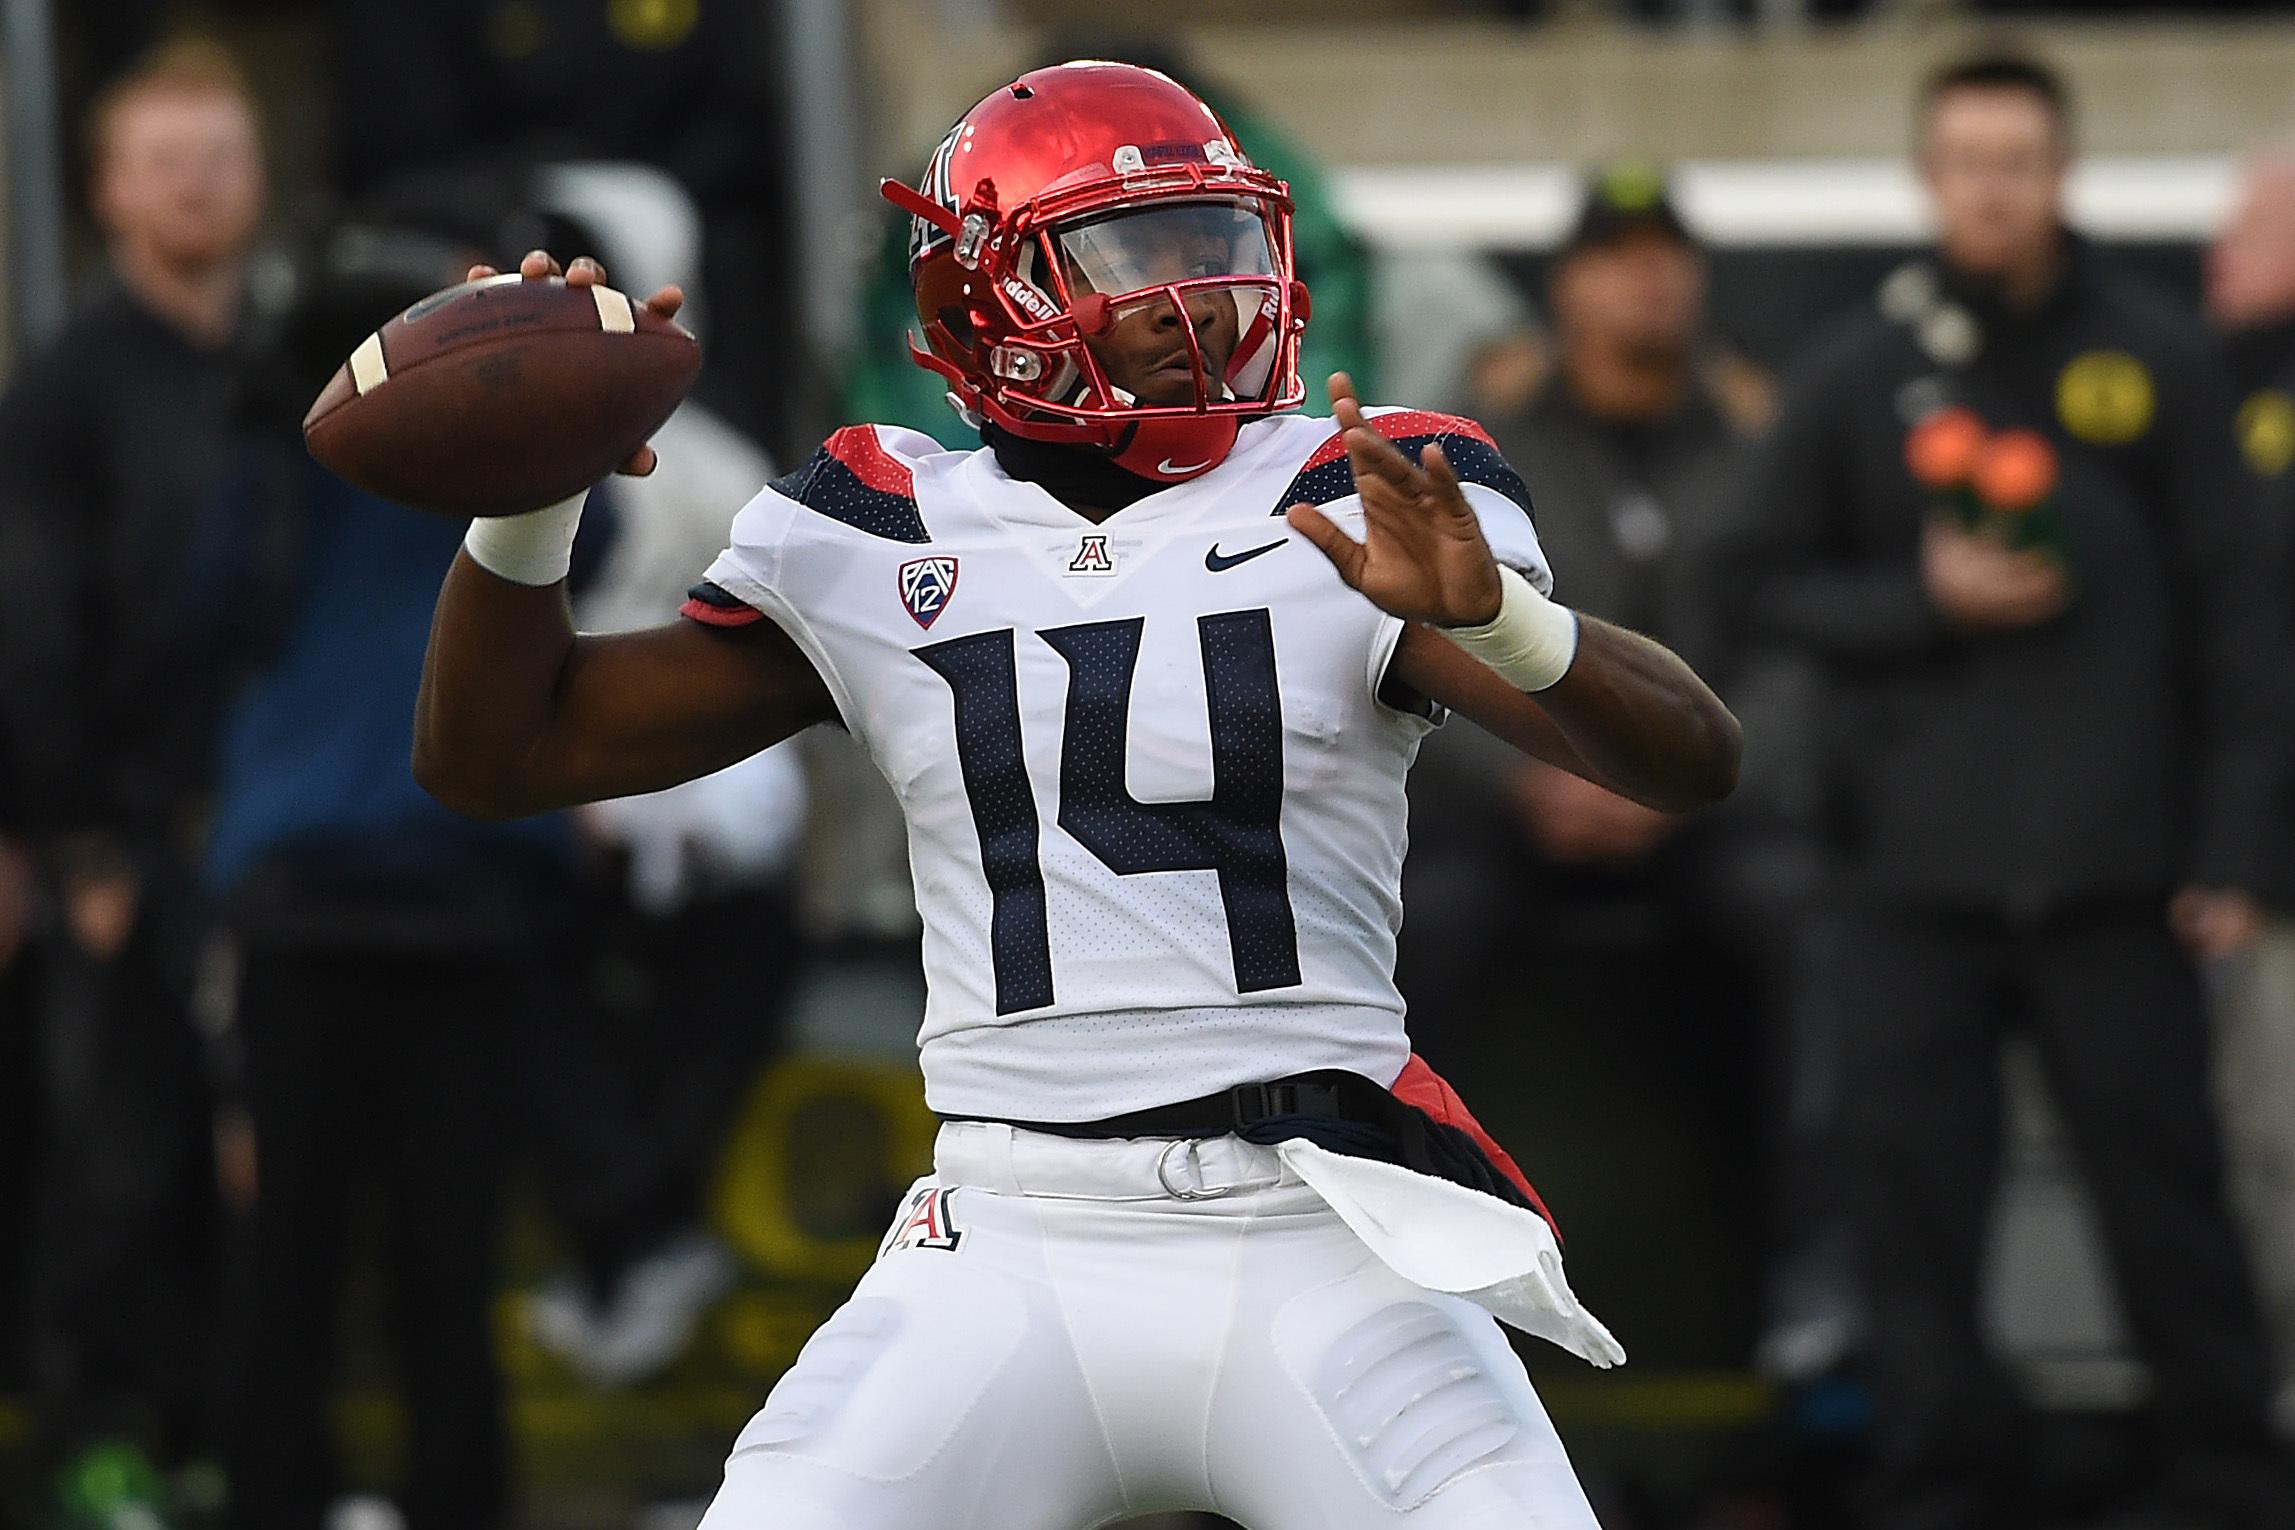 College Fantasy Football 2018: Mock Draft, Cheat Sheet and